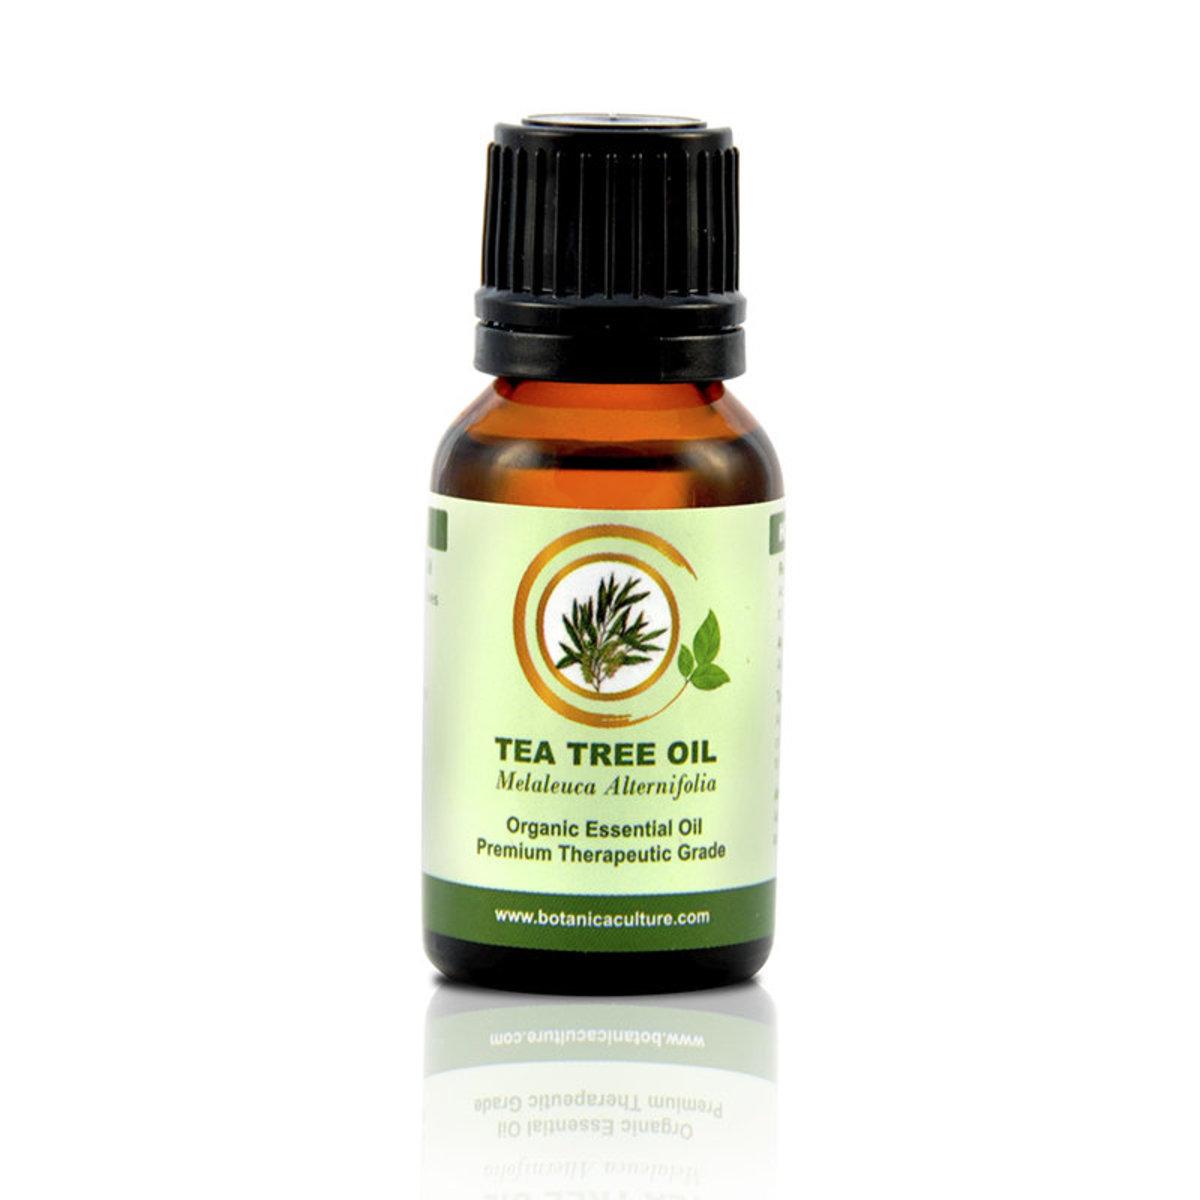 Botanica Culture Organic Tea Tree Oil 15ml